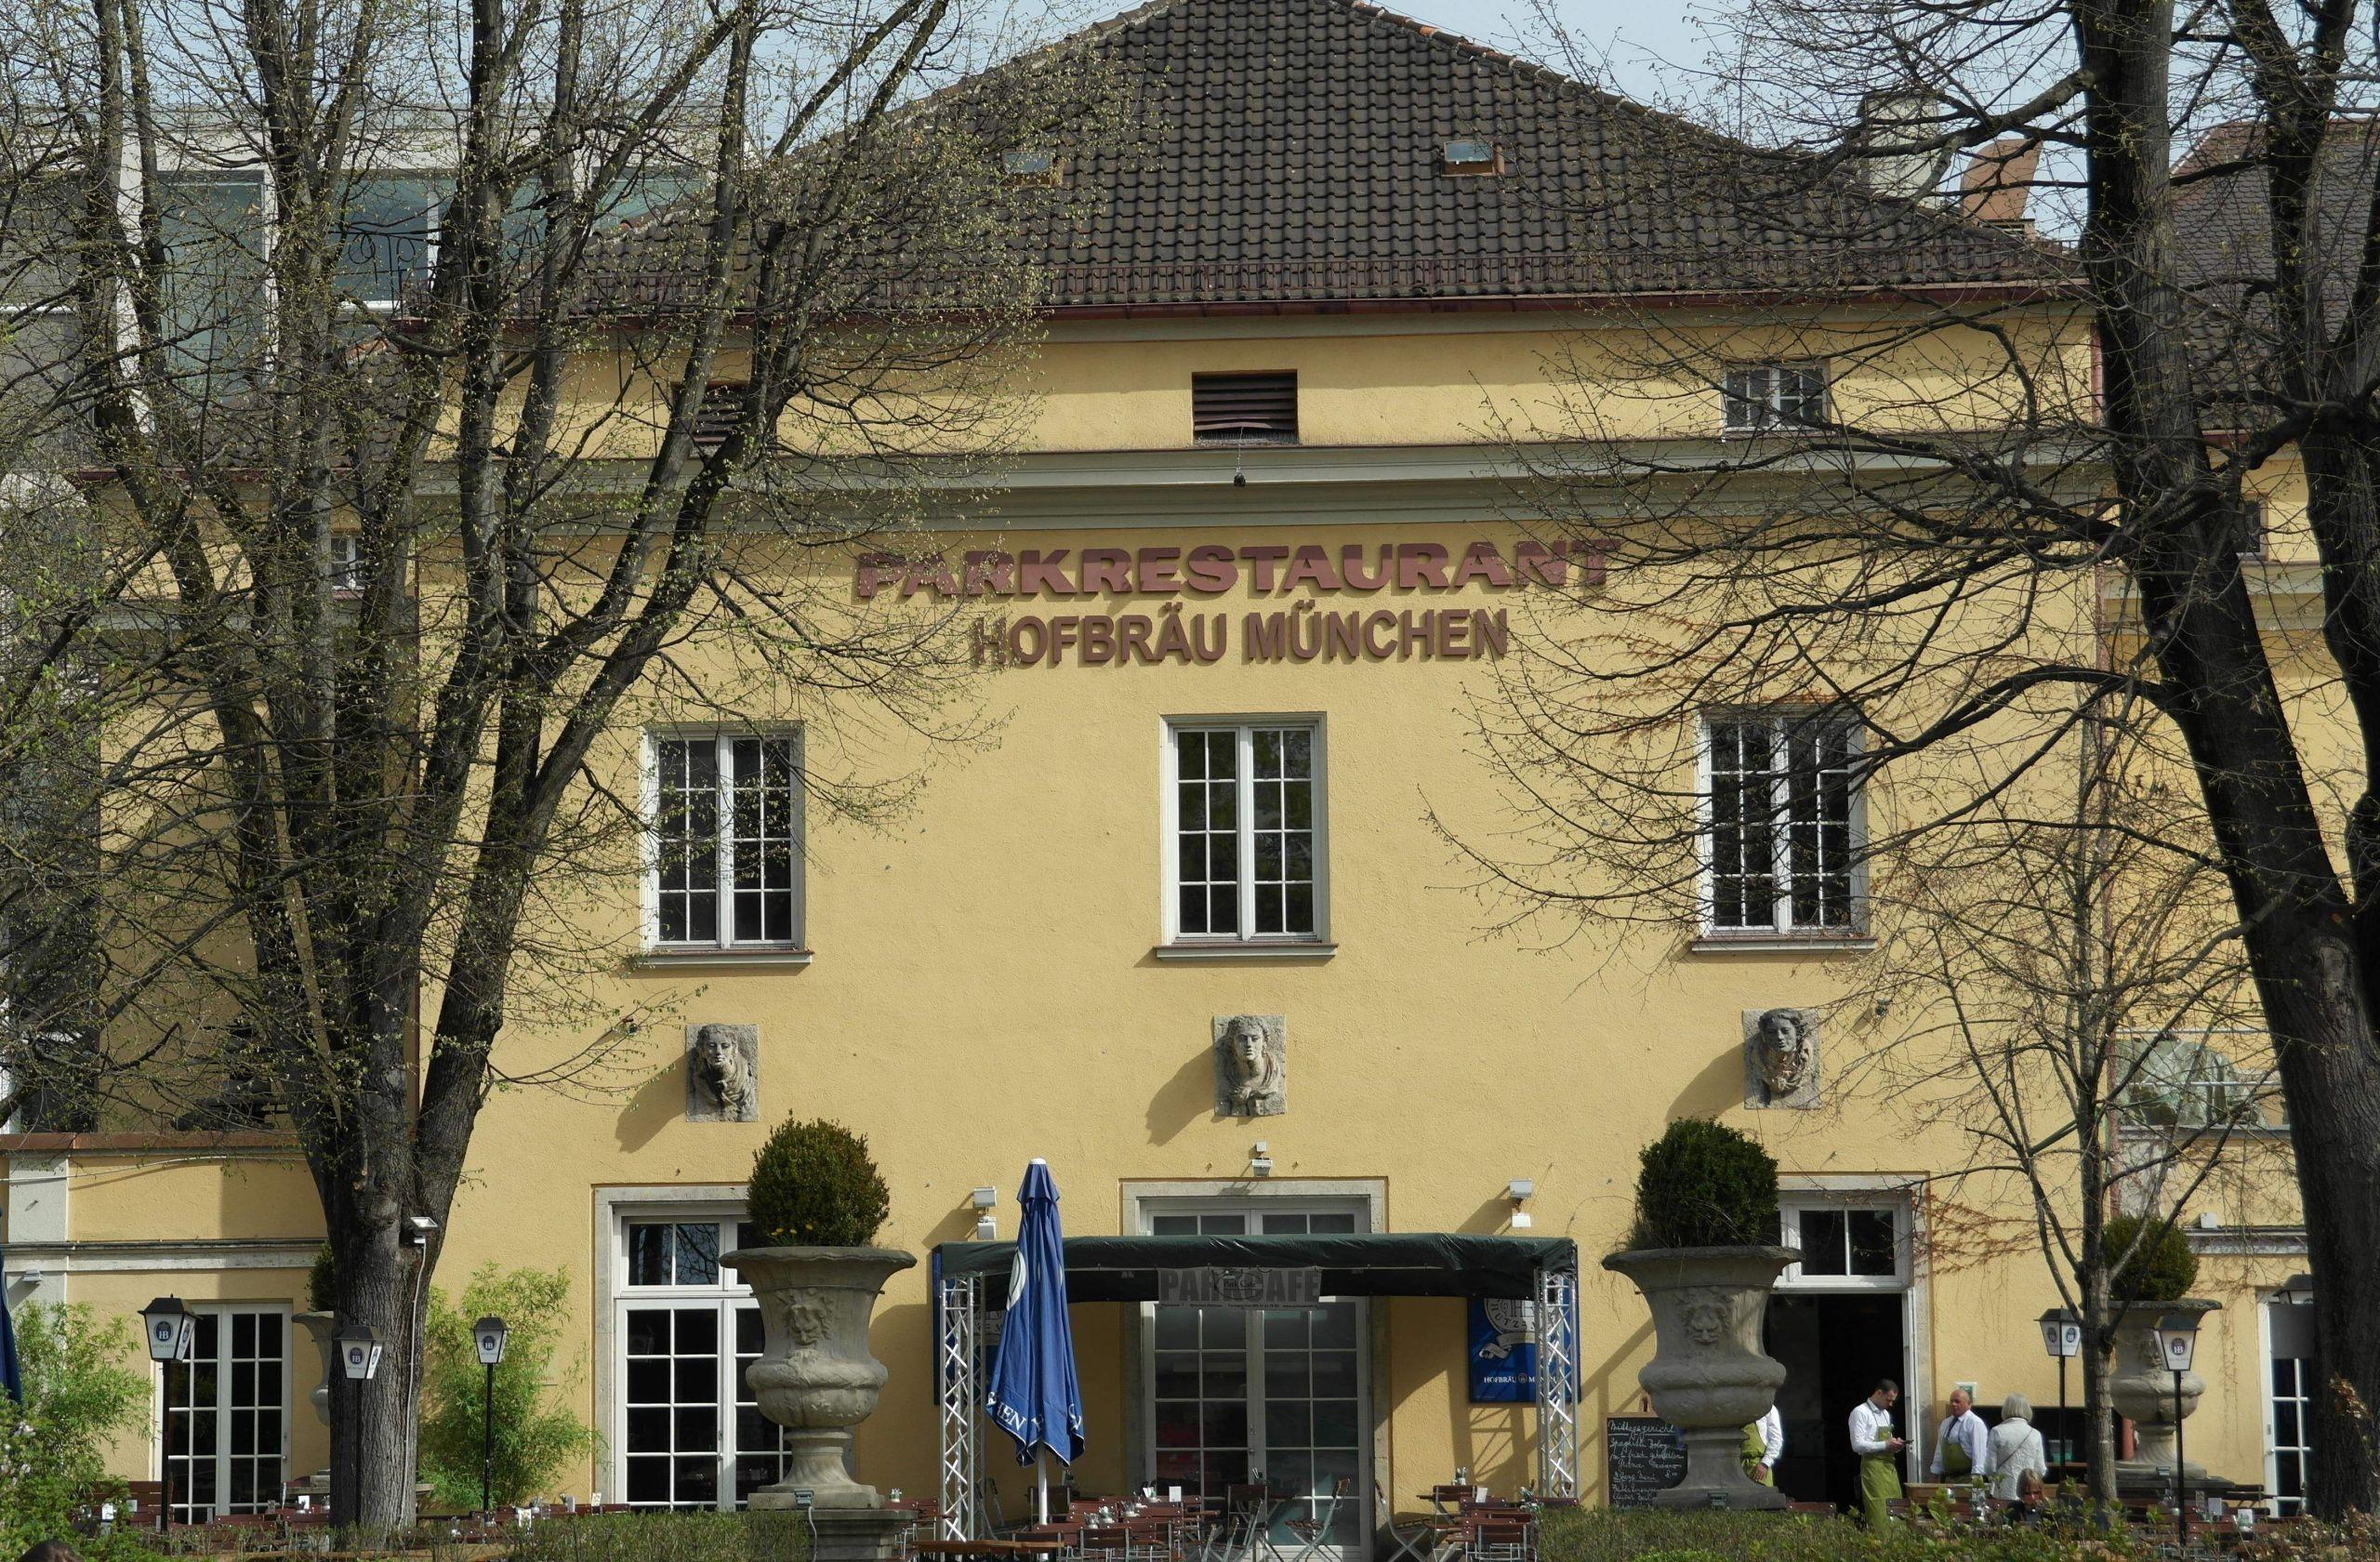 Botanische Garten Berlin Inspirierend Alter Botanischer Garten Muenchen Munich Garten Anlegen